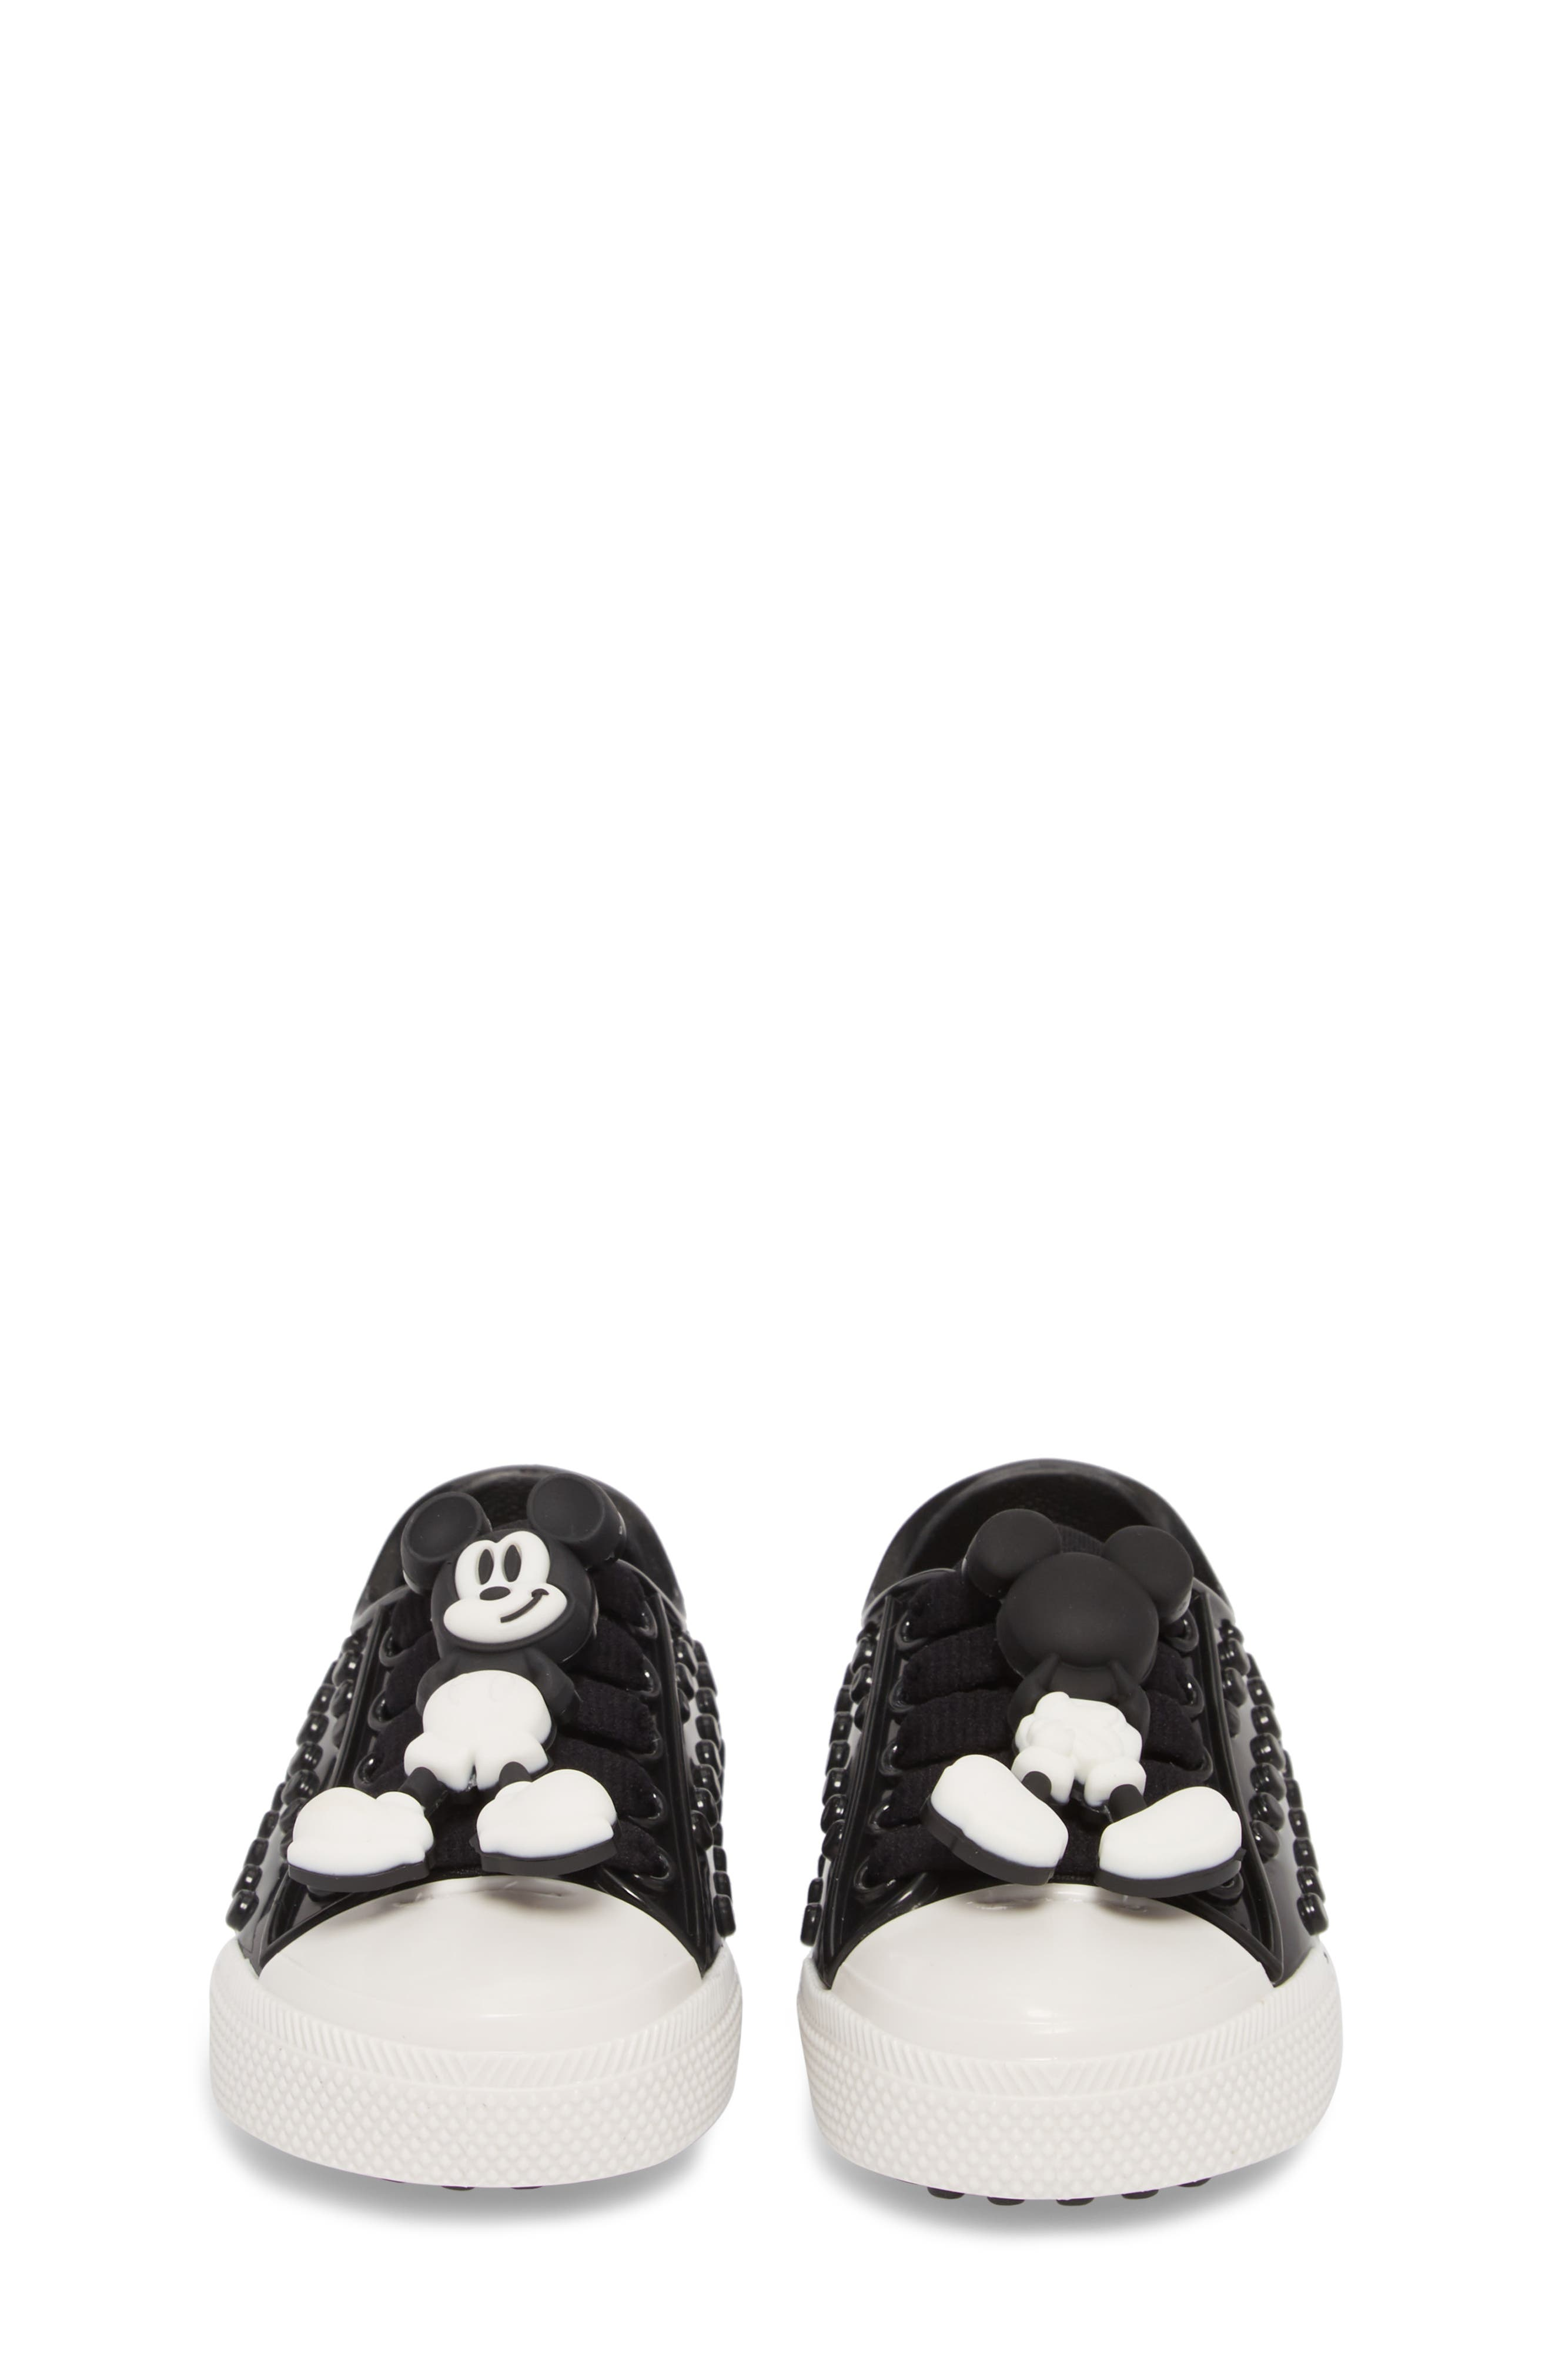 Polibolha Disney's Mickey Mouse<sup>®</sup> Sneaker,                             Alternate thumbnail 5, color,                             001